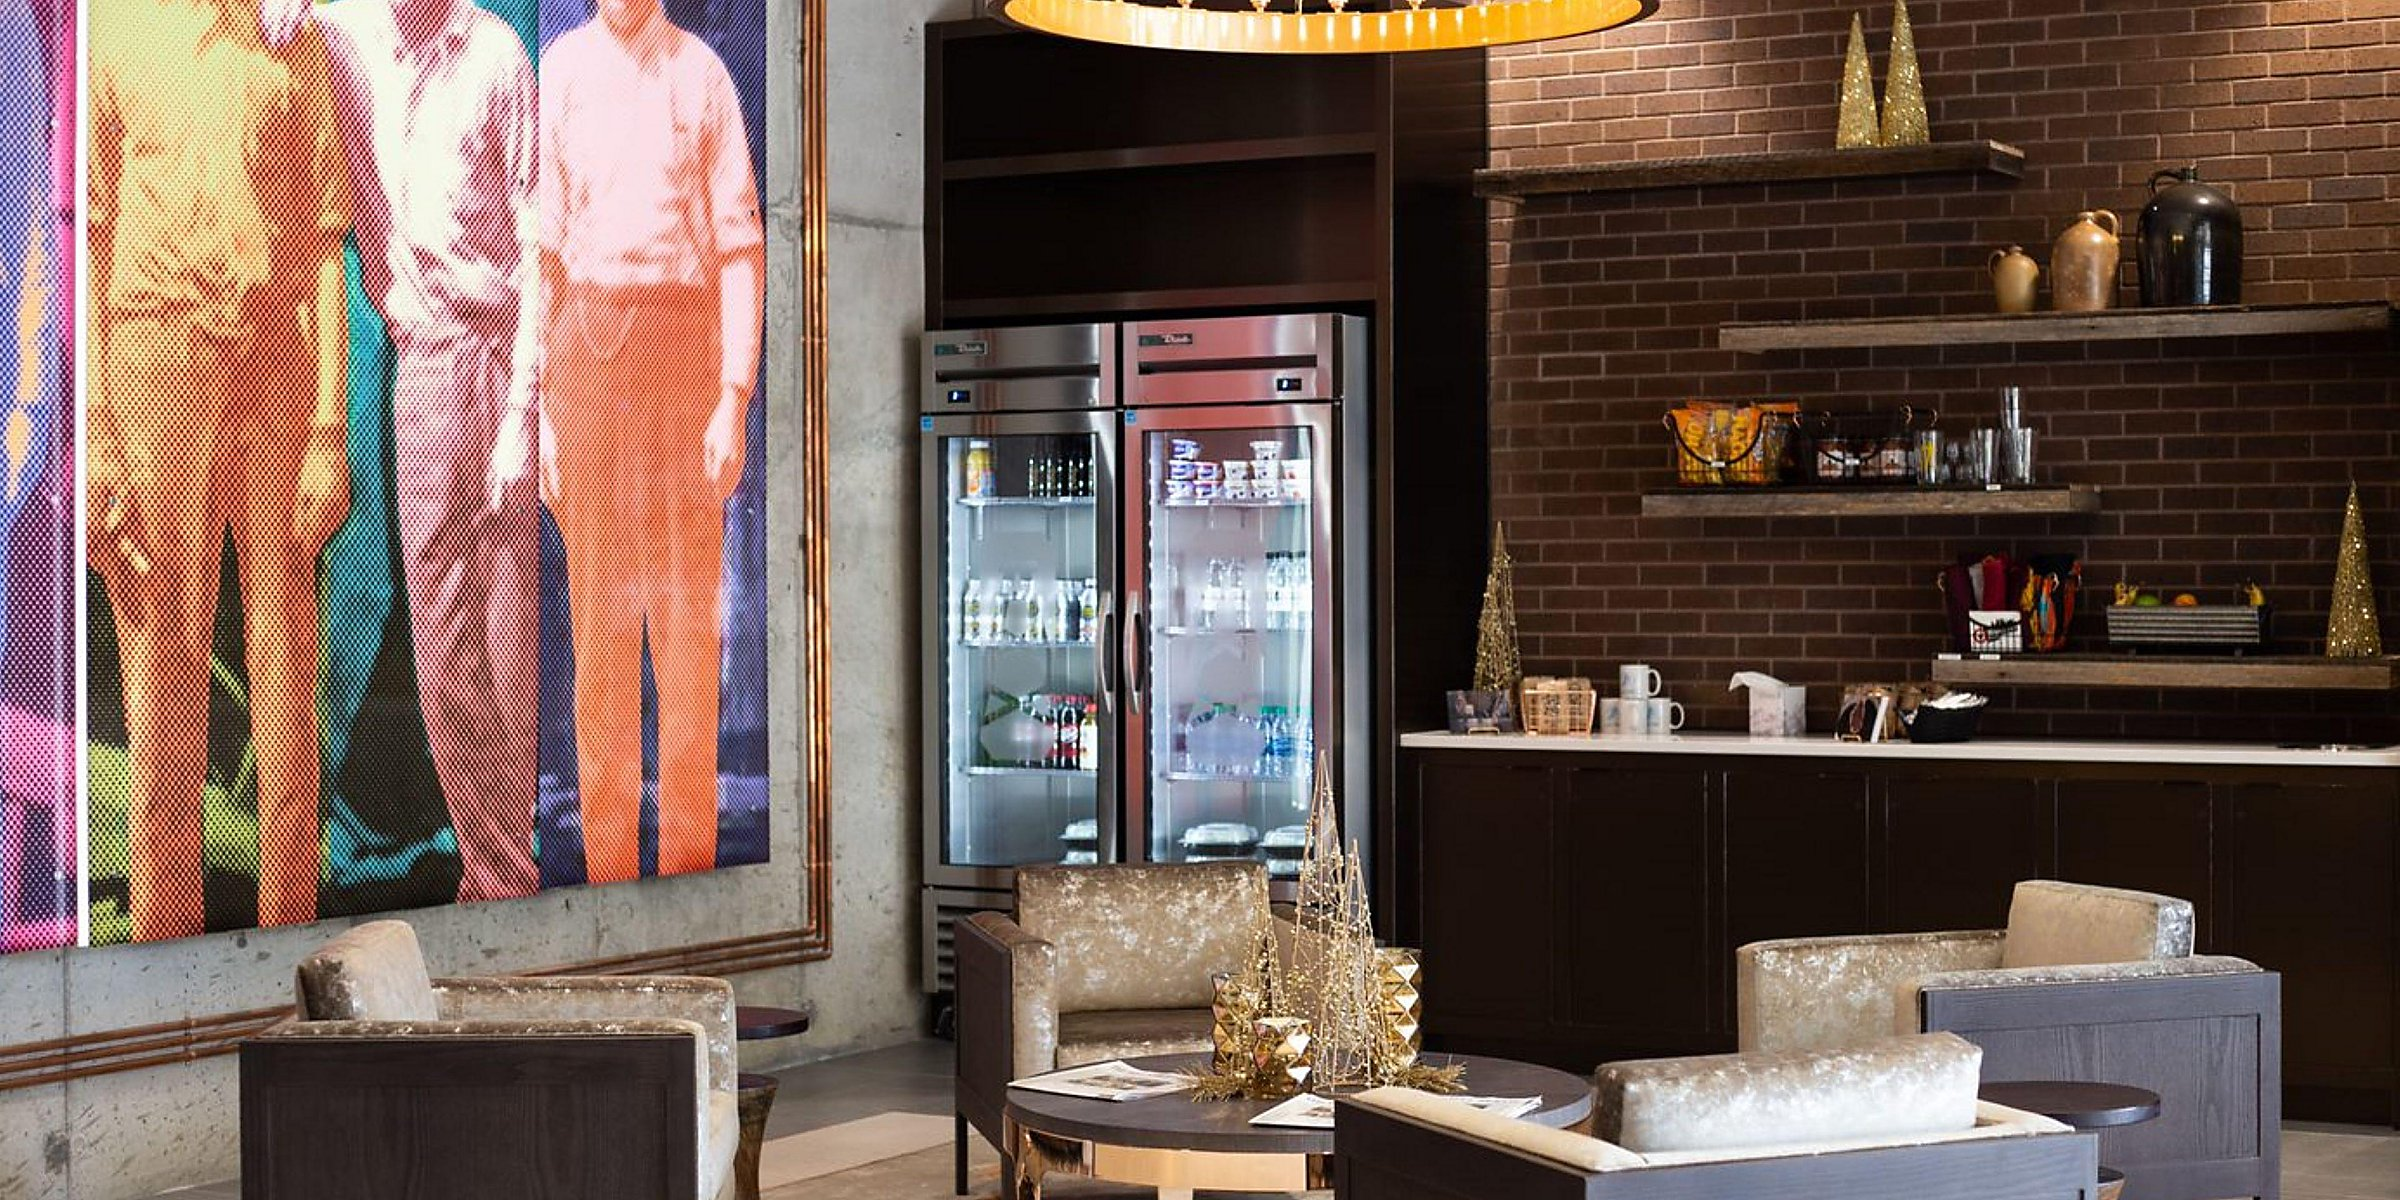 Boutique Downtown Tulsa Hotels Hotel Indigo Tulsa Downtown